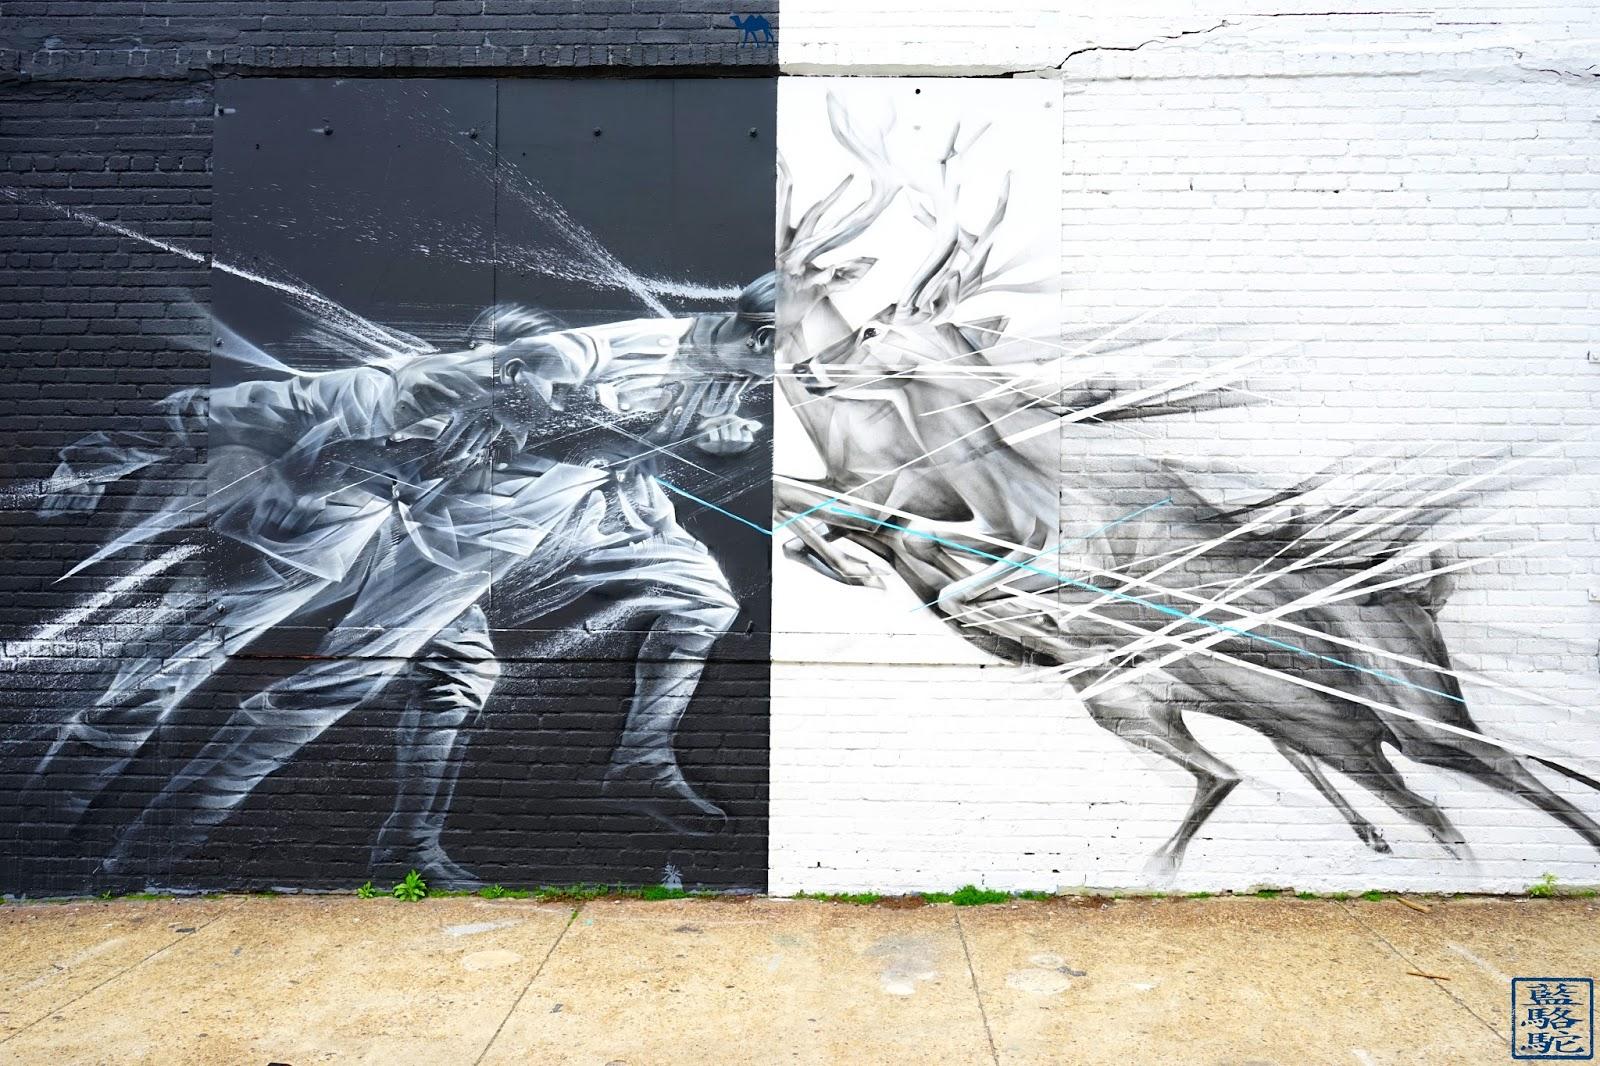 Le Chameau Bleu - Home Cerf - Bushwick - Balade à Brooklyn New York